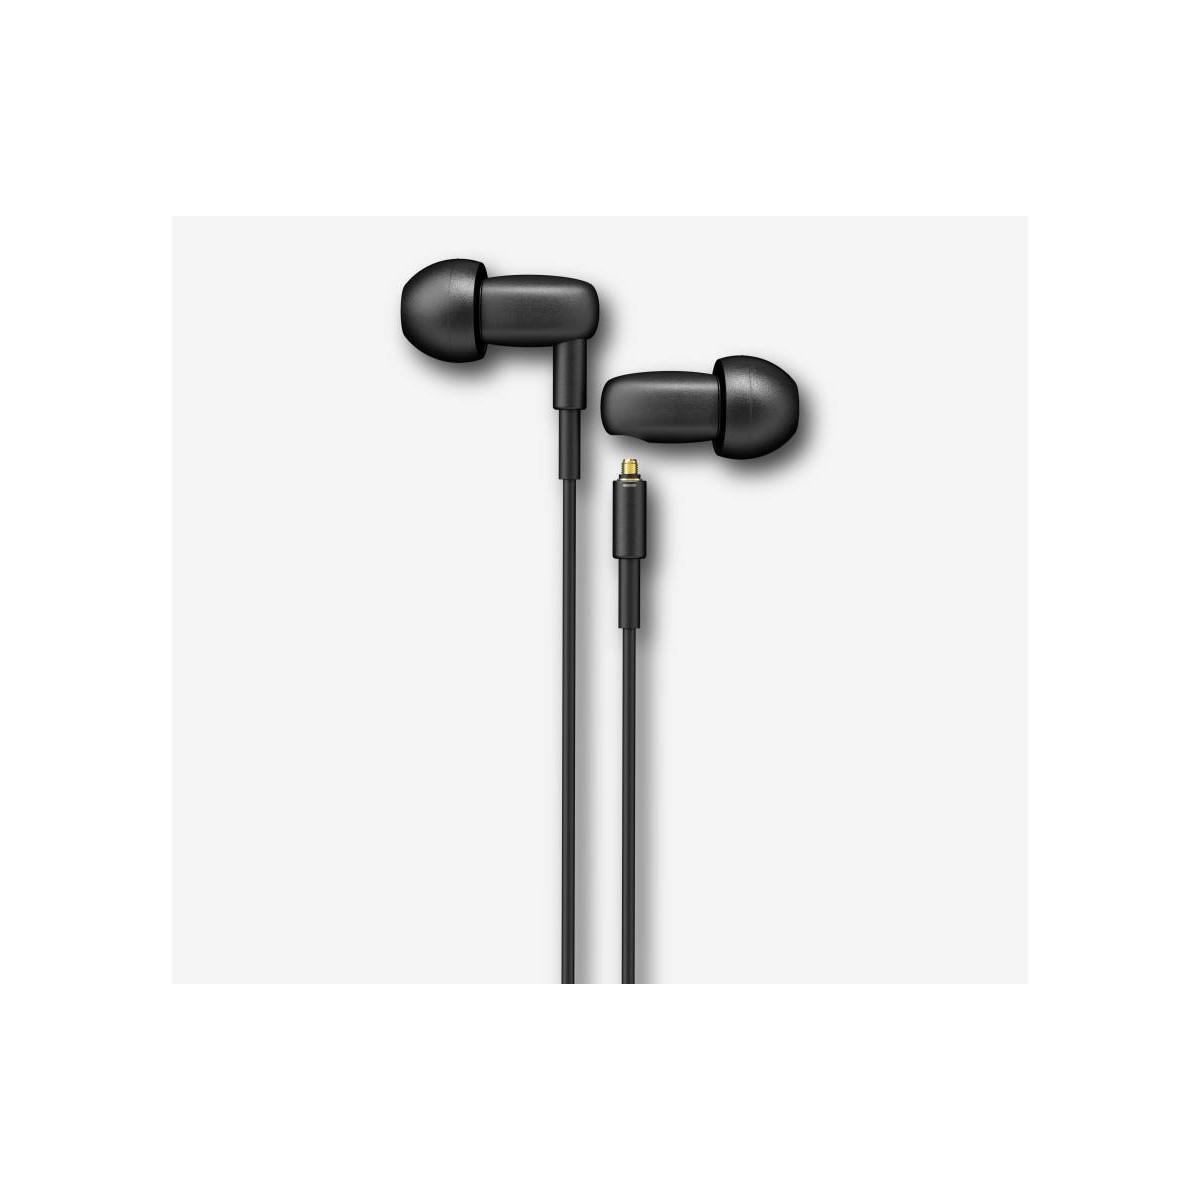 Audiophile Earphones q-JAYS iOS